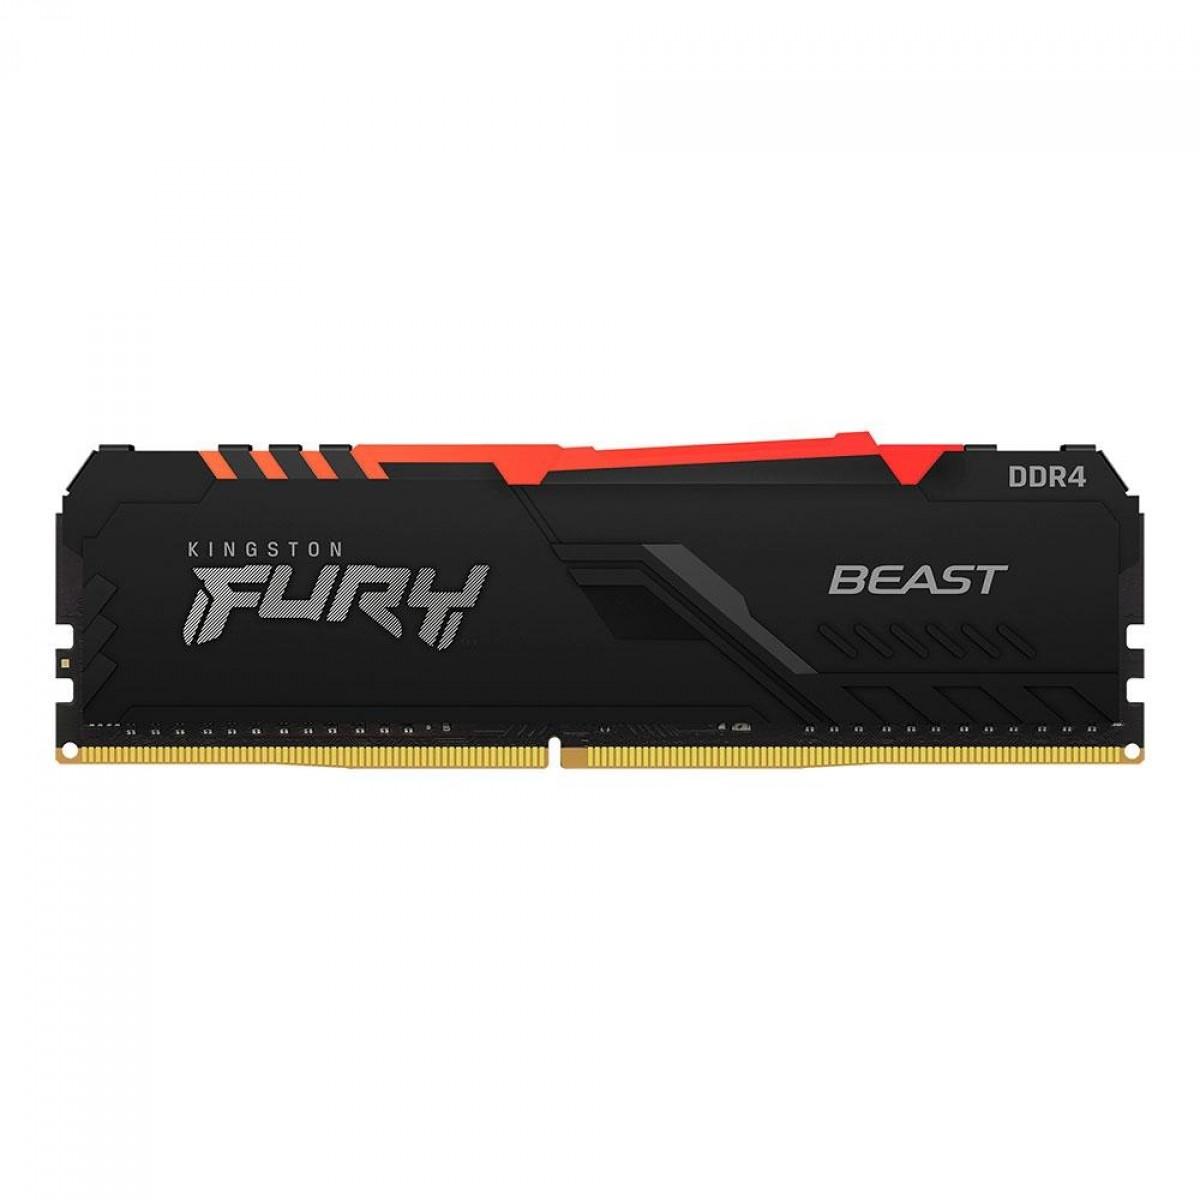 Memória Kingston Fury Beast RGB, 8GB, 3600Mhz, DDR4, CL17, Preto, KF436C17BBA/8